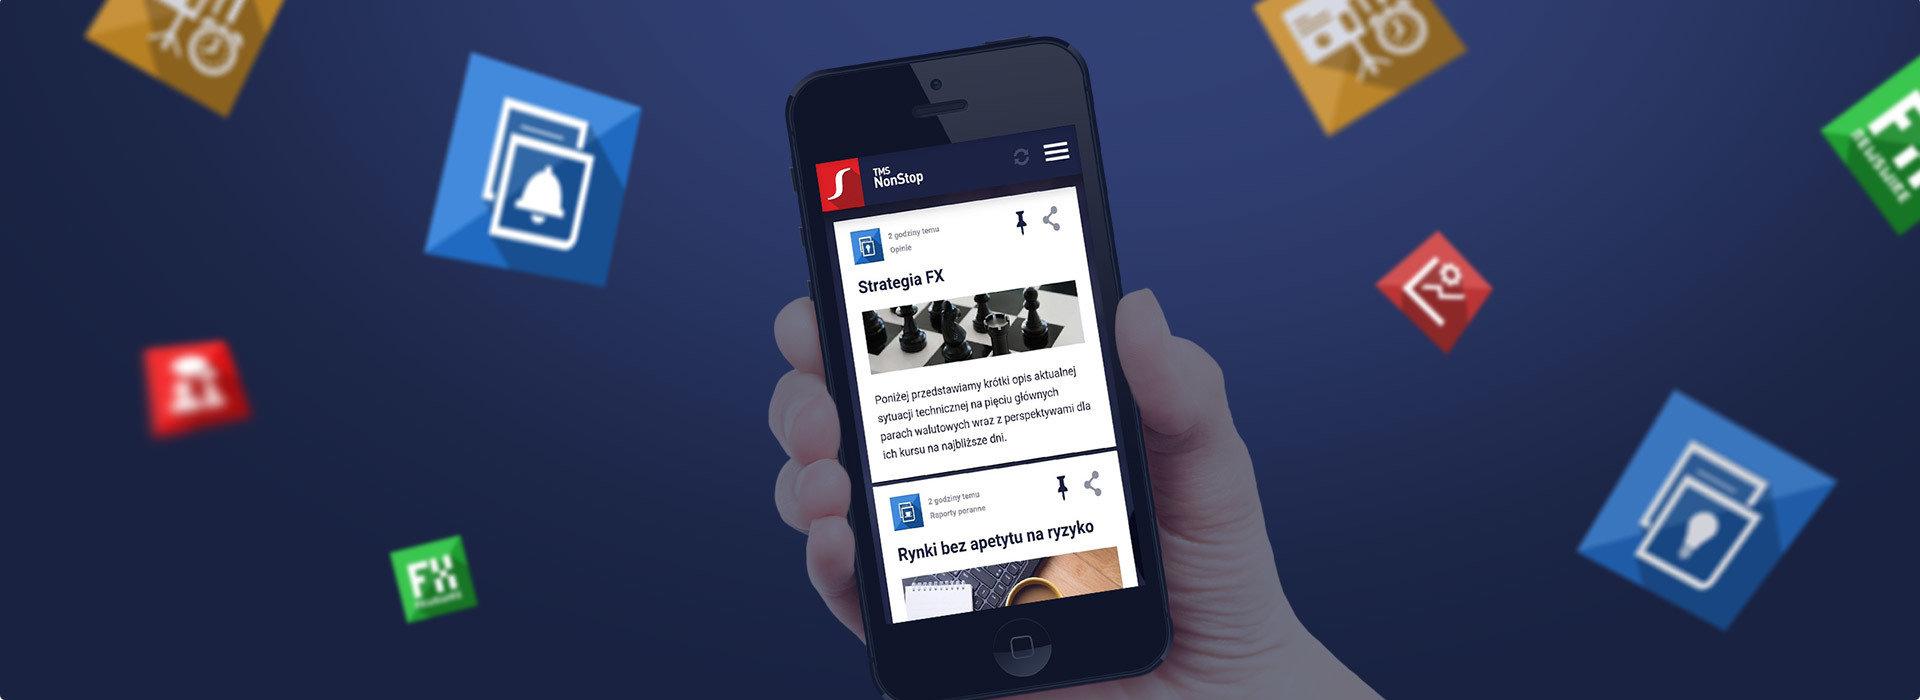 Aplikacja mobilna TMS NonStop na platformy Android i iOS ... pobierz już teraz!